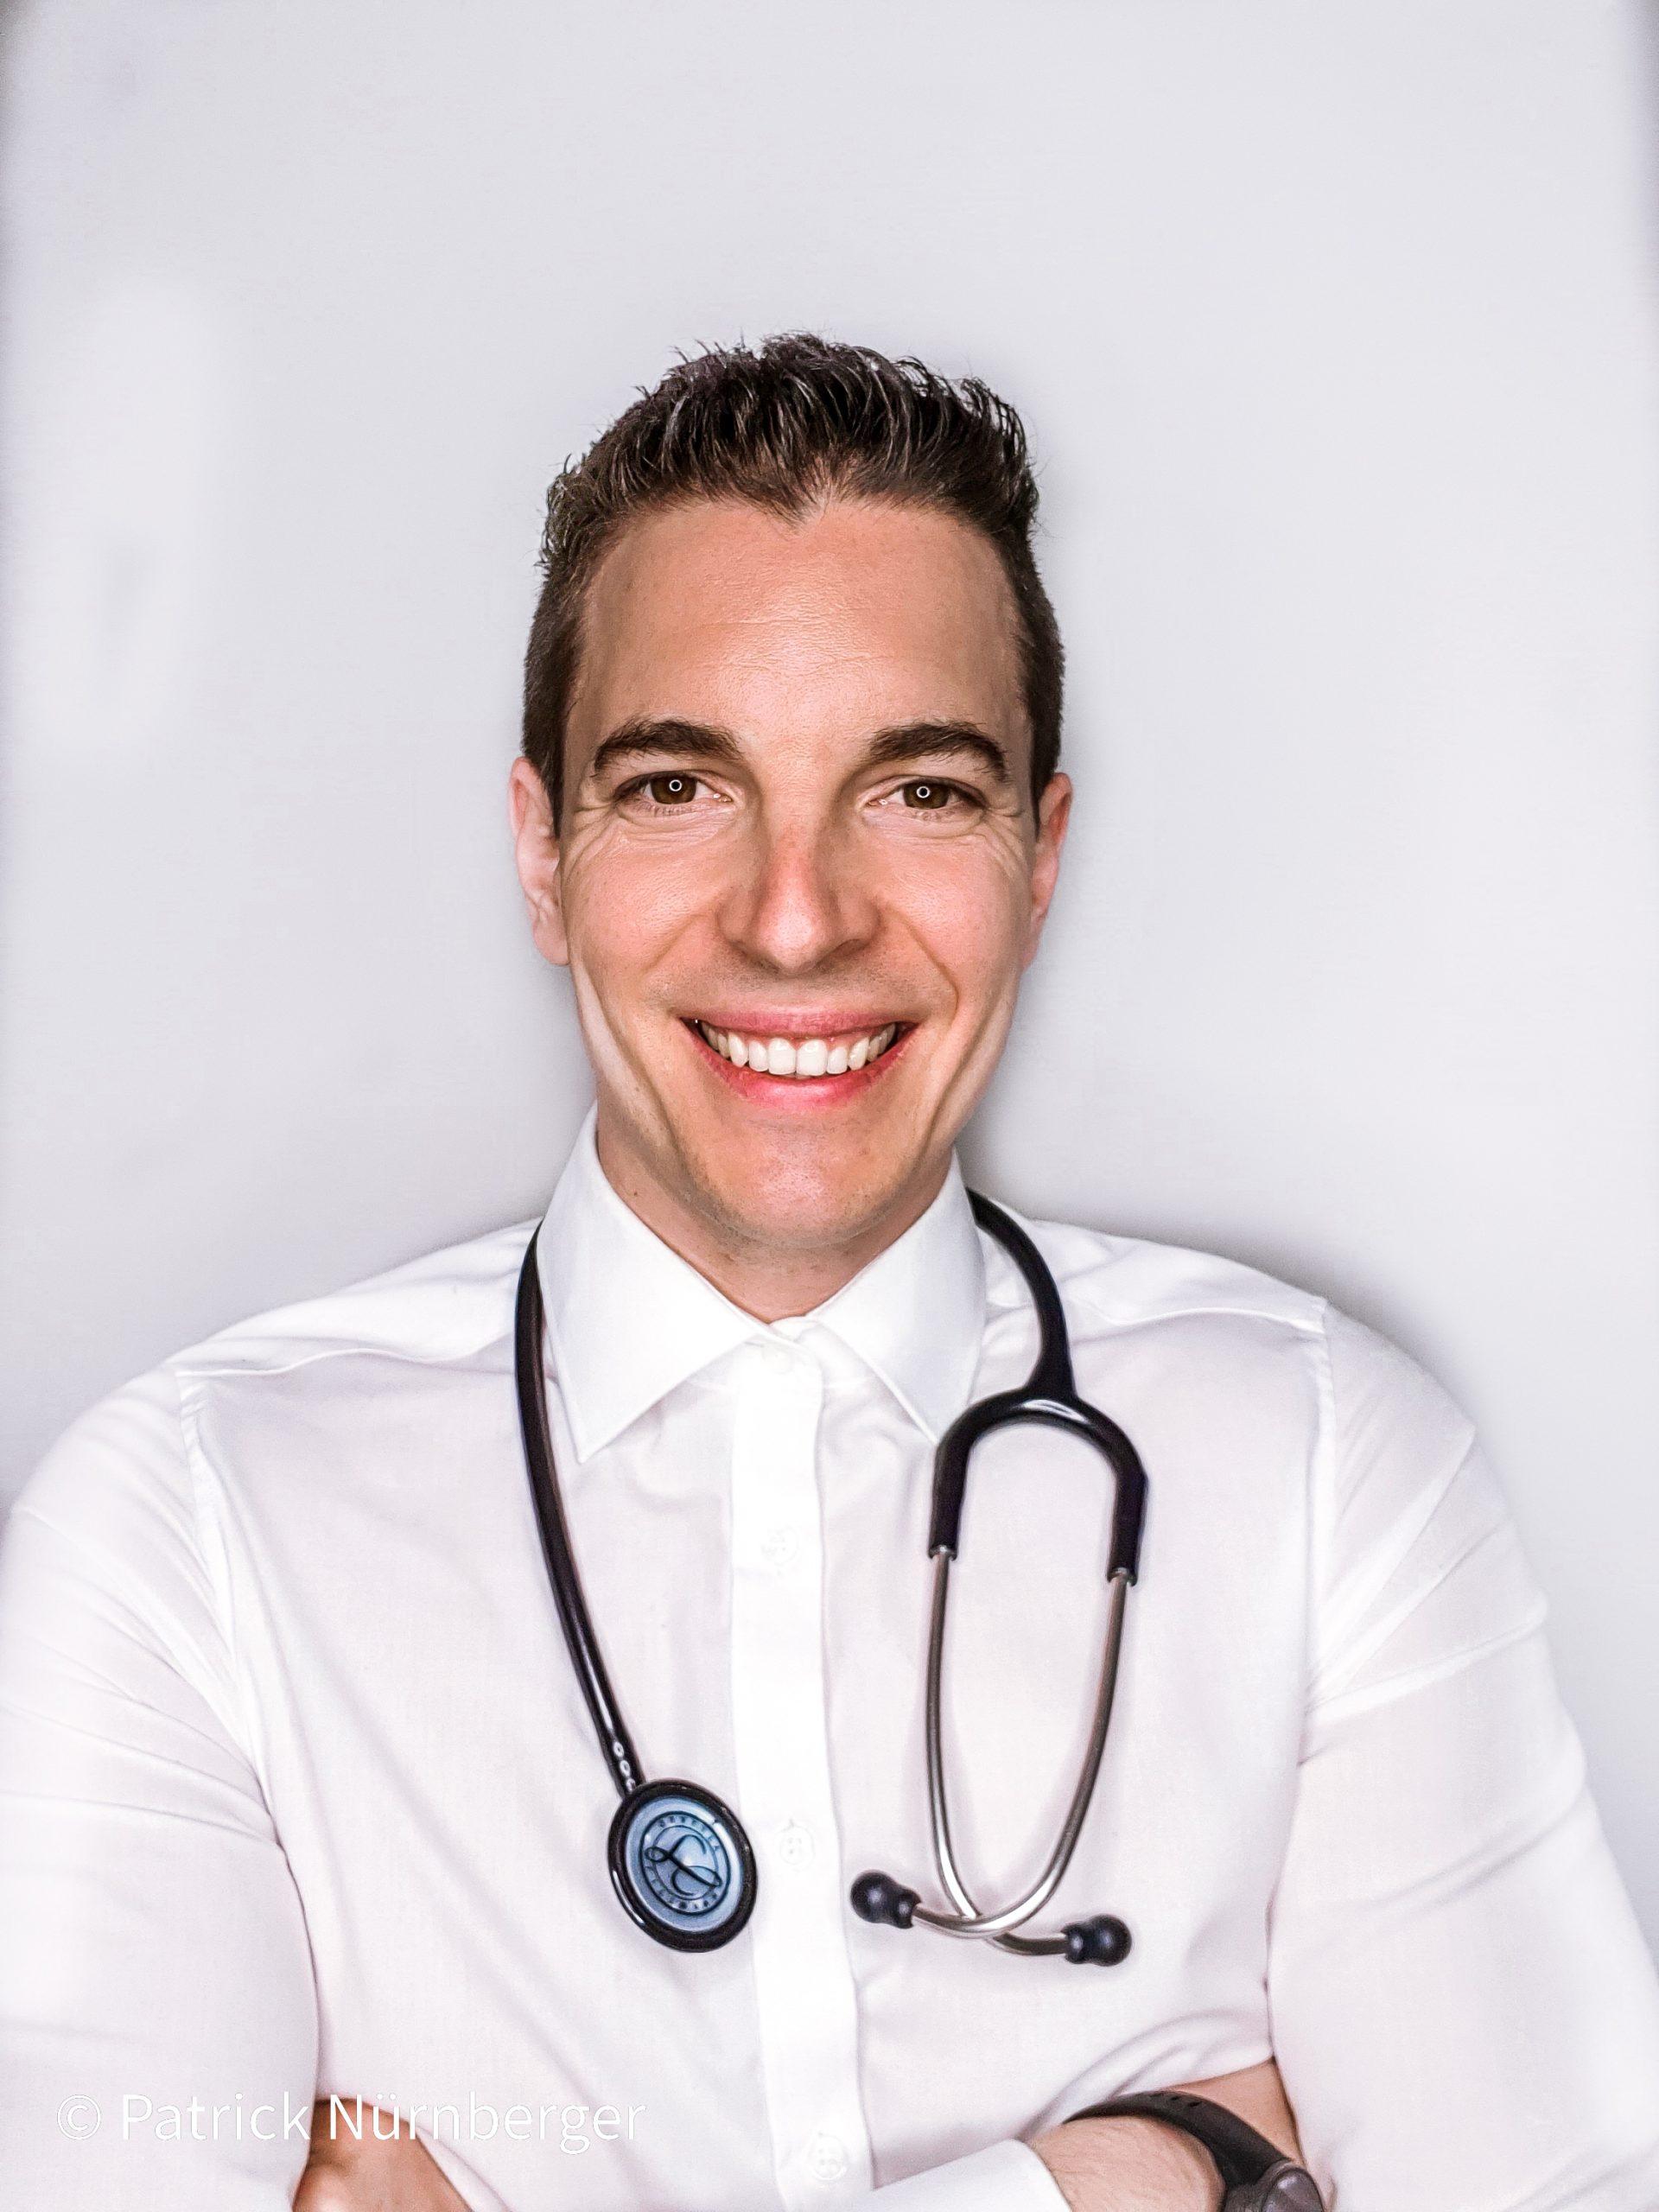 Hr. Dr. Paul Schadler